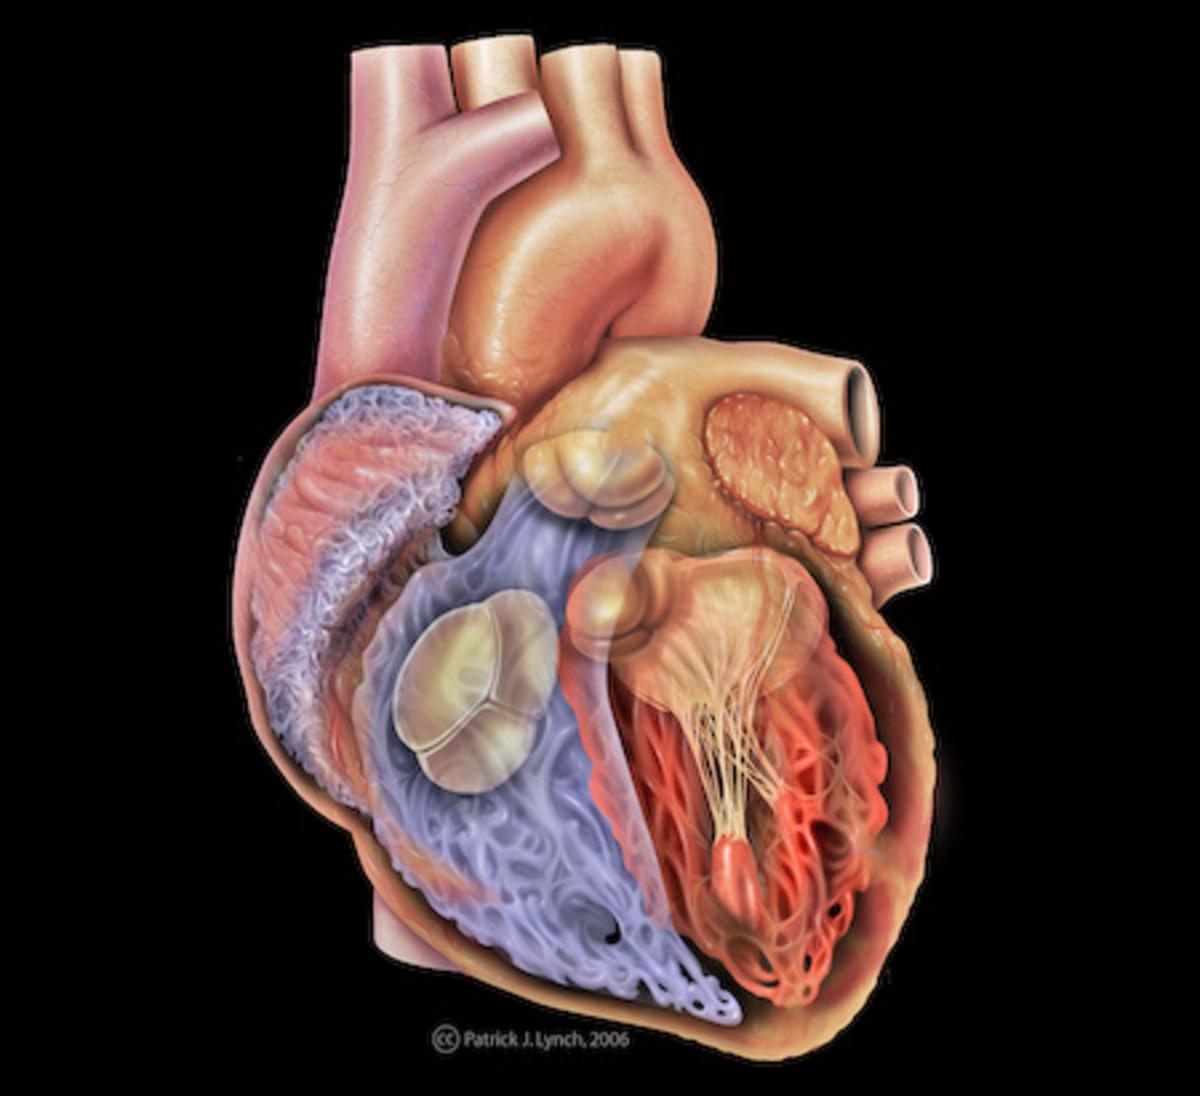 Dr Sinatra's Top Ten Nutritional Supplements for Women's Heart Health